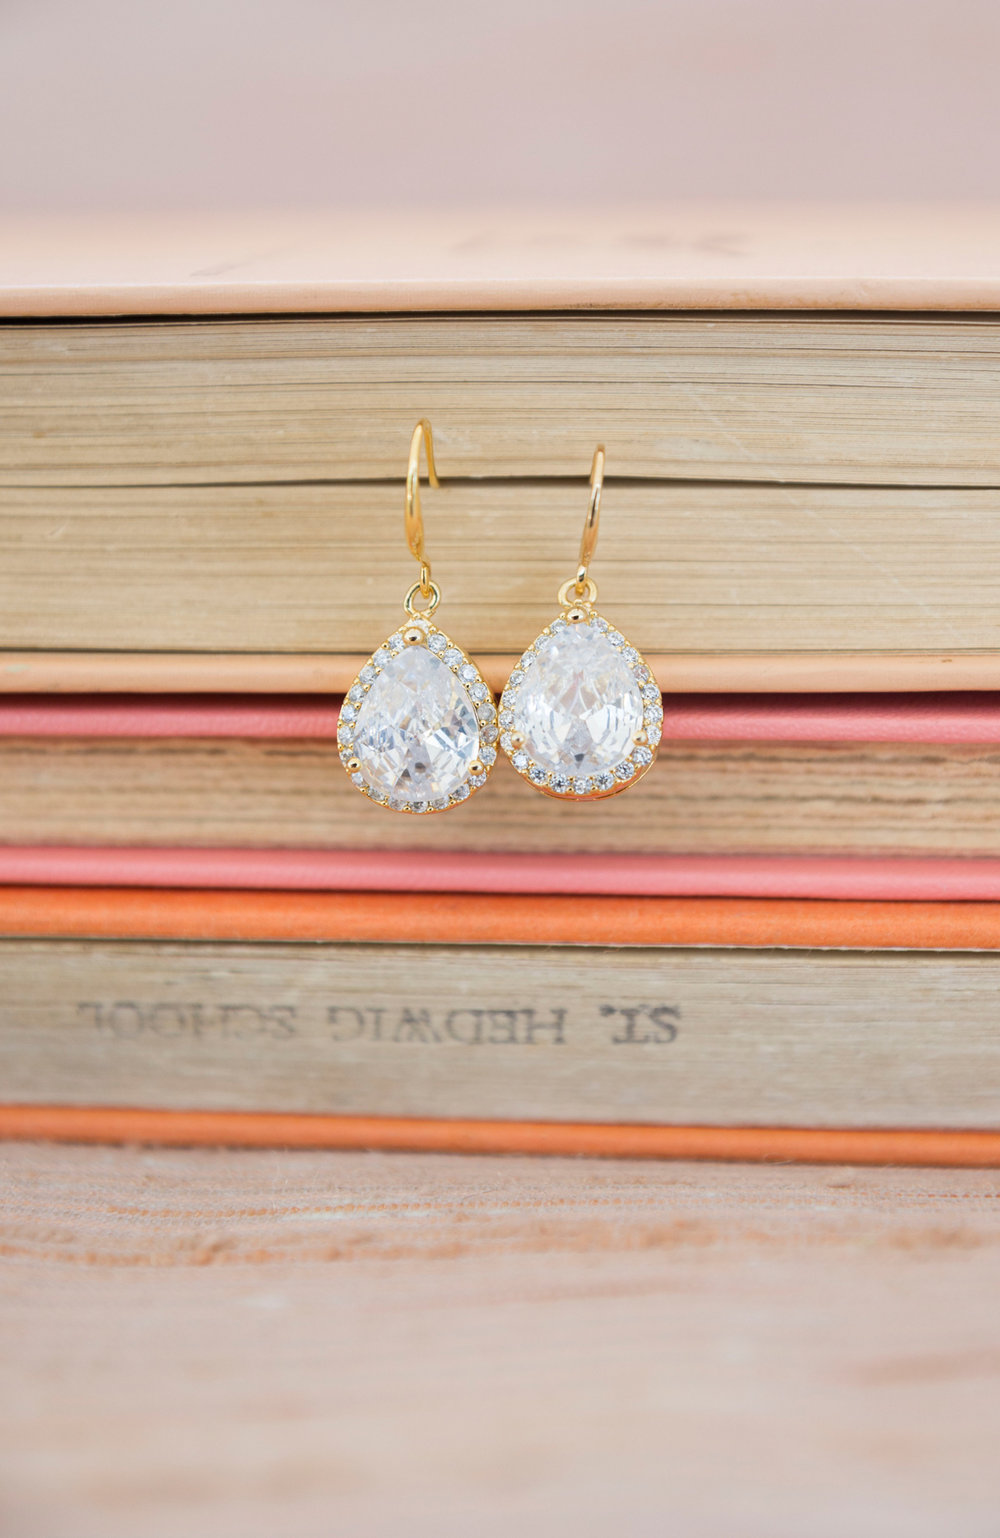 Gold Tear Drop Bridal Earrings - A McCoy Equestrian Center Wedding - Peterson Design & Photography